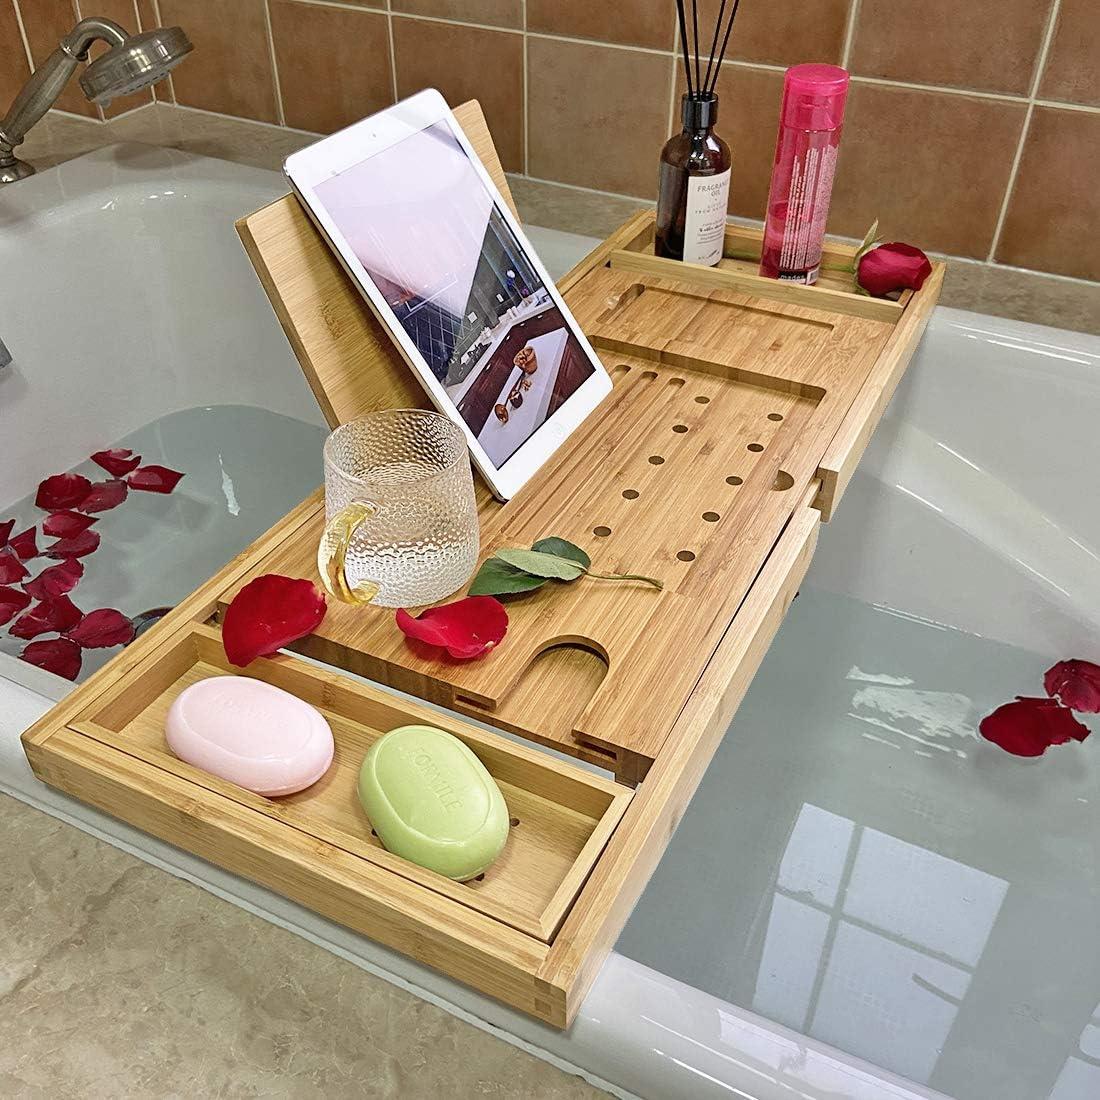 Simhoo Charlotte Mall Wide Bamboo Credence Bath Caddy Bathtub Wooden Hol Tray Adjustable